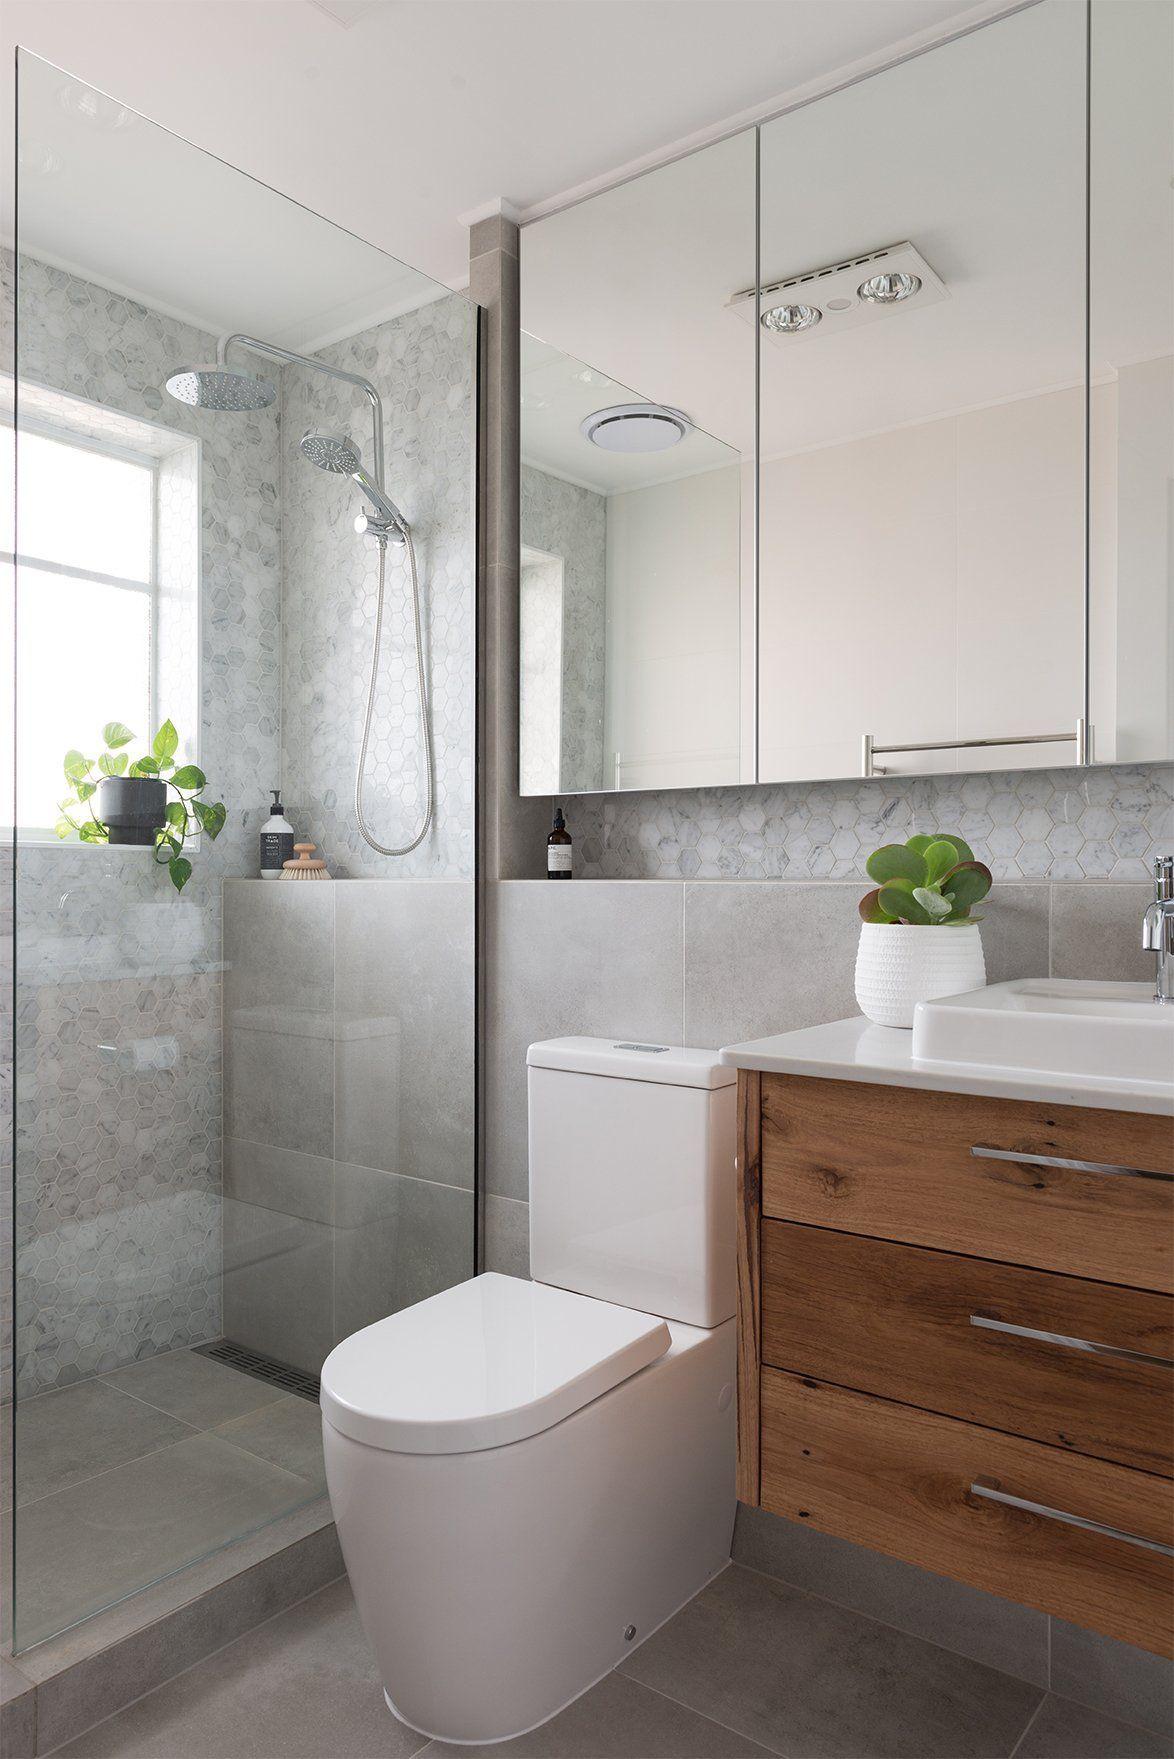 Littletoorak Bathroom After Modern Bathroom Renovation Timber Vanity Walk In Shower Carrara M In 2020 Modern Bathroom Renovations Modern Bathroom Concrete Bathroom